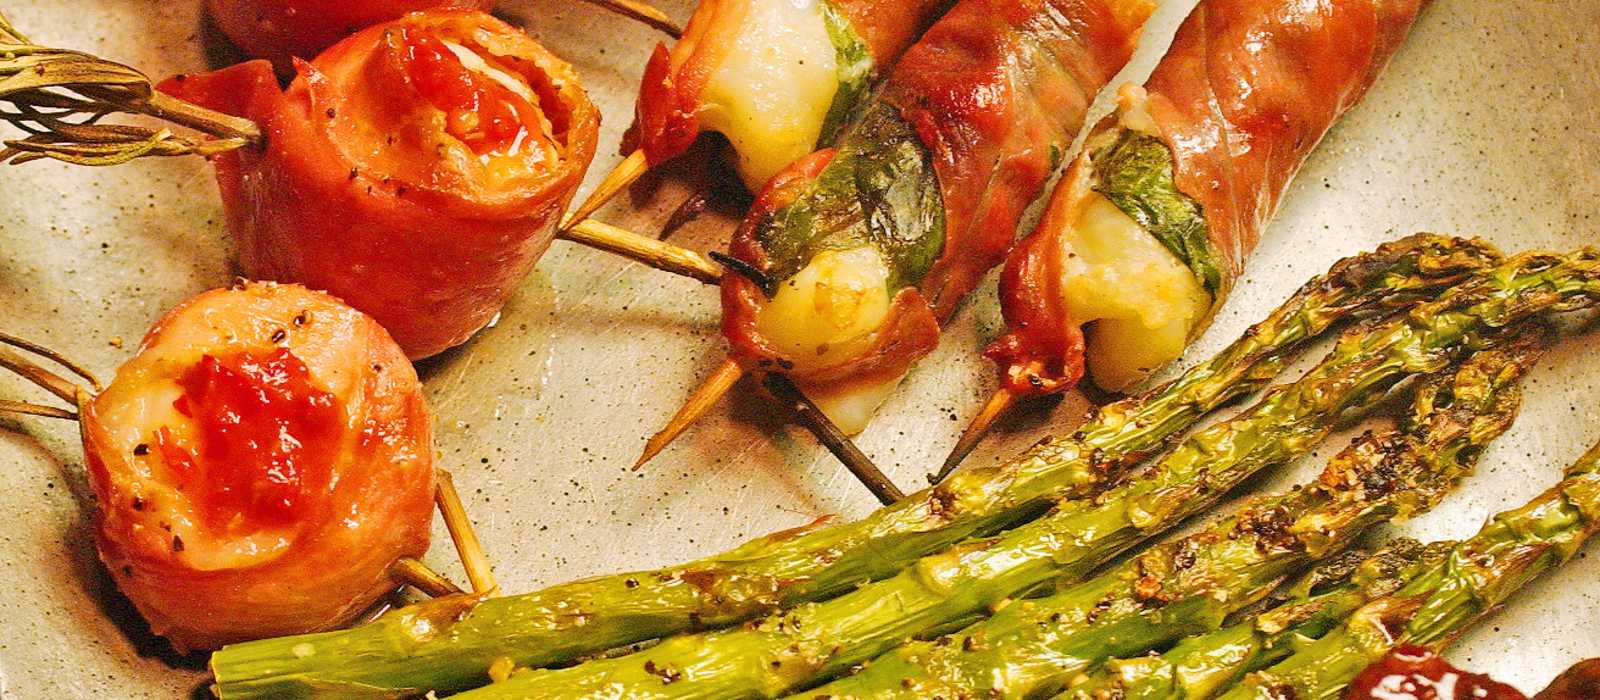 Pork and Seafood Platte